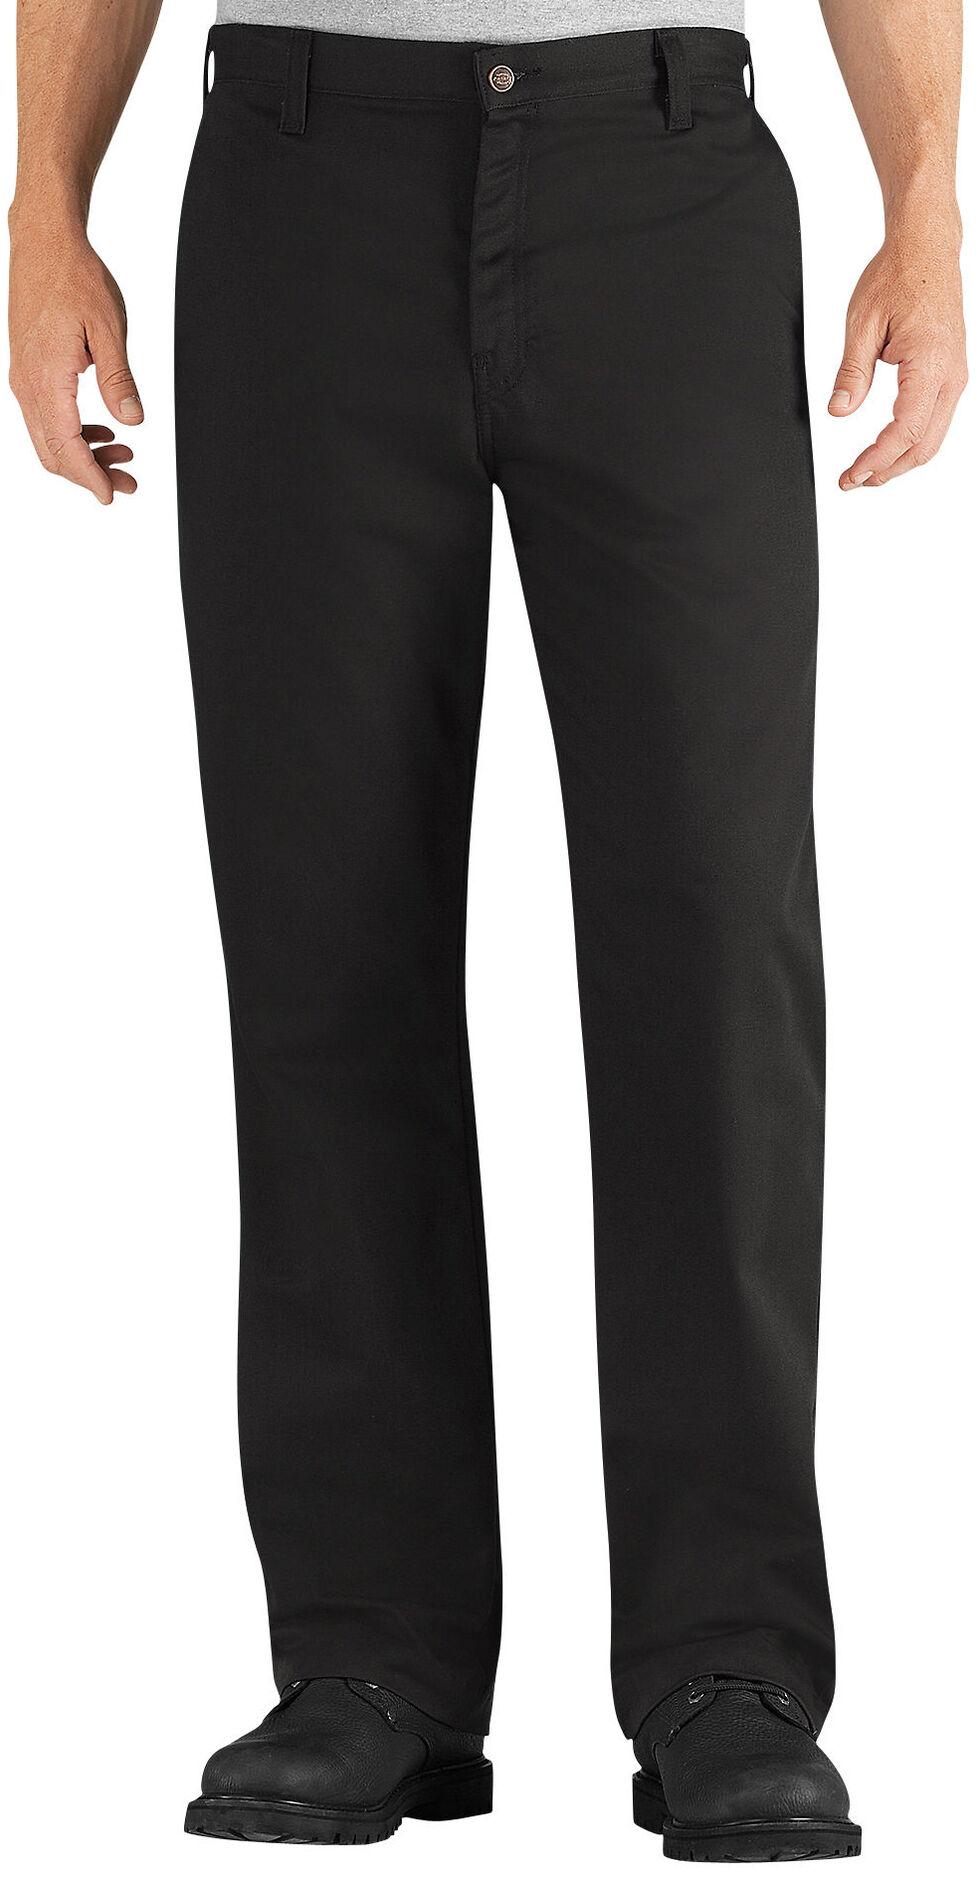 Dickies Flame Resistant Twill Pants - Tall, Black, hi-res